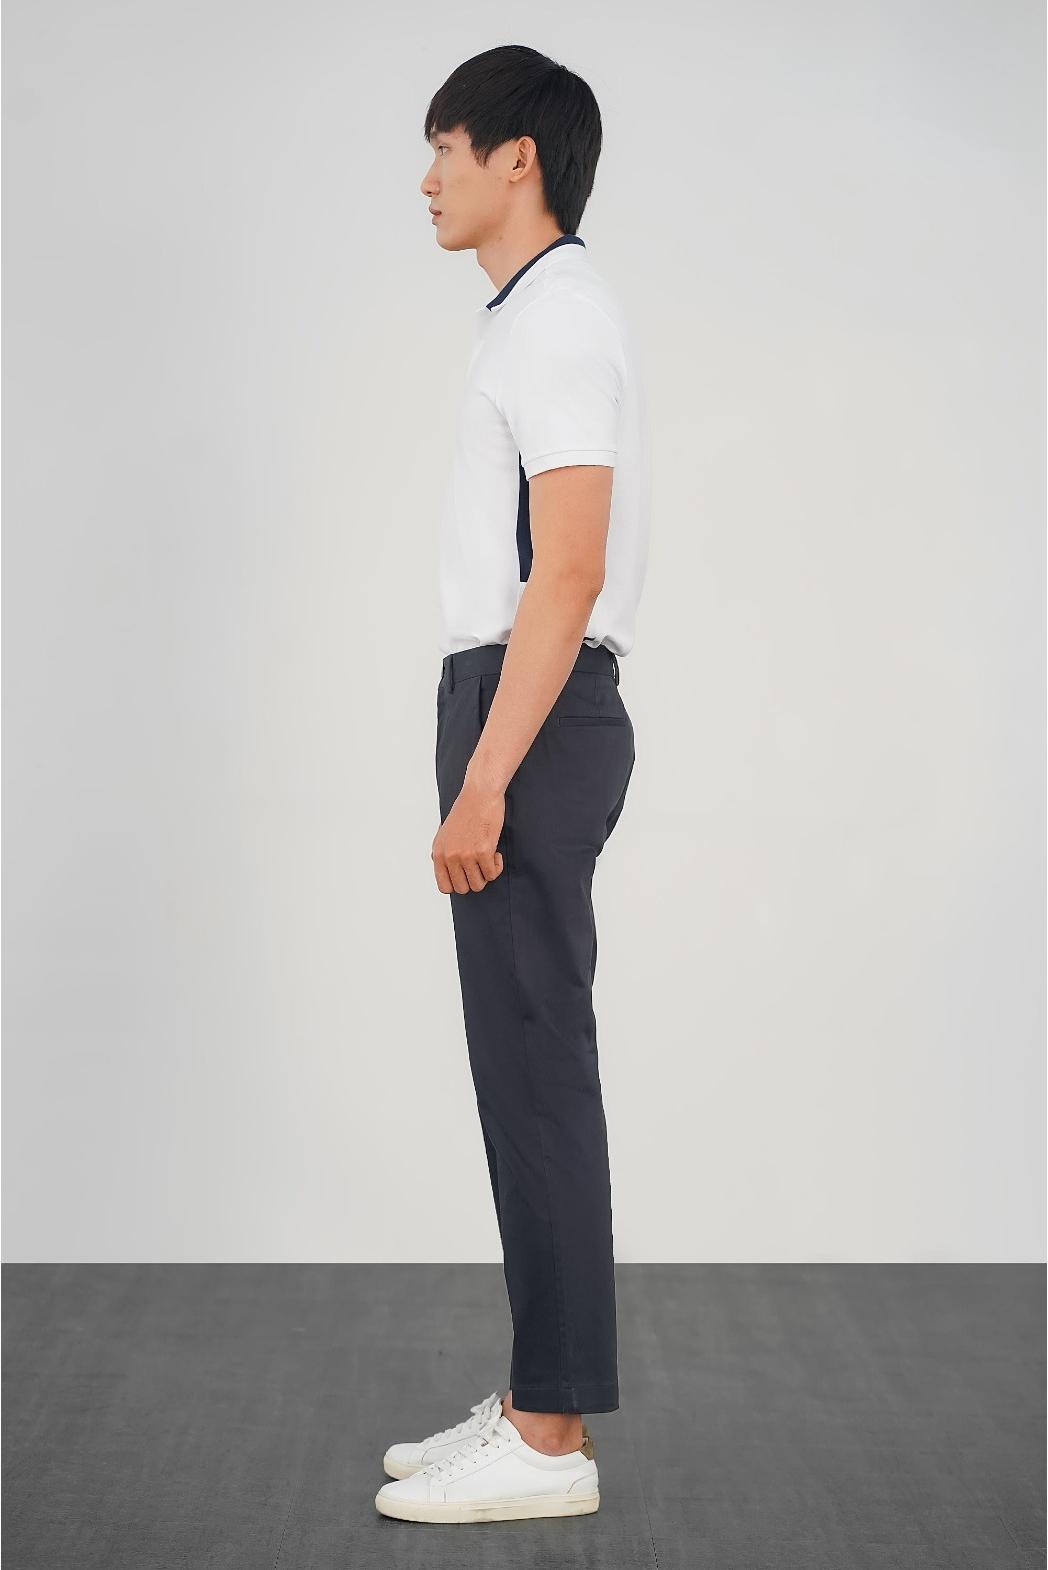 Áo polo phối màu, decor Rib. FITTED form - 10S21POL016